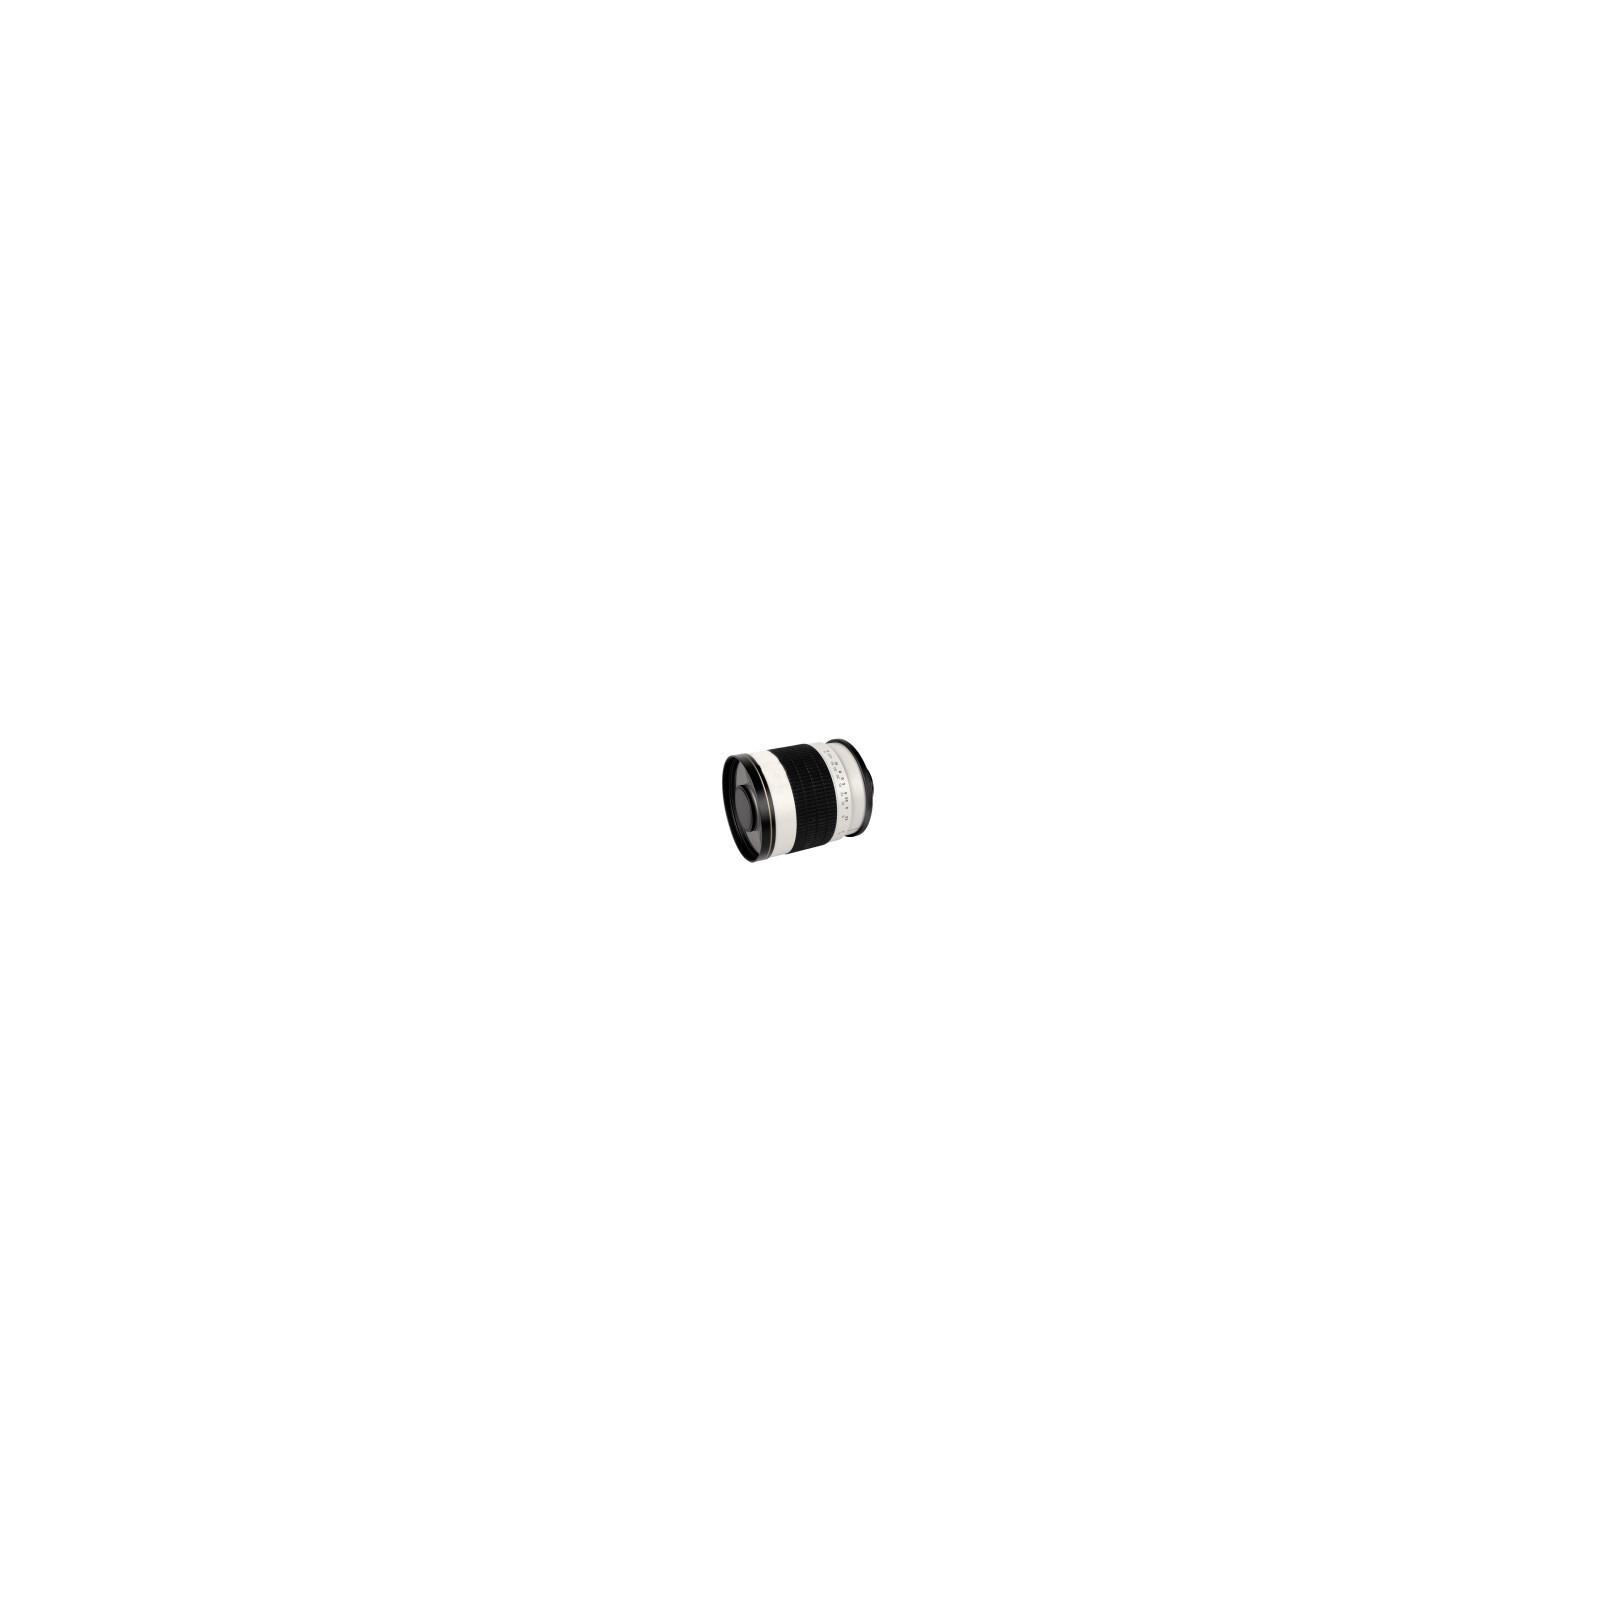 walimex pro 500/6,3 DSLR Spiegel Canon EF Weiß